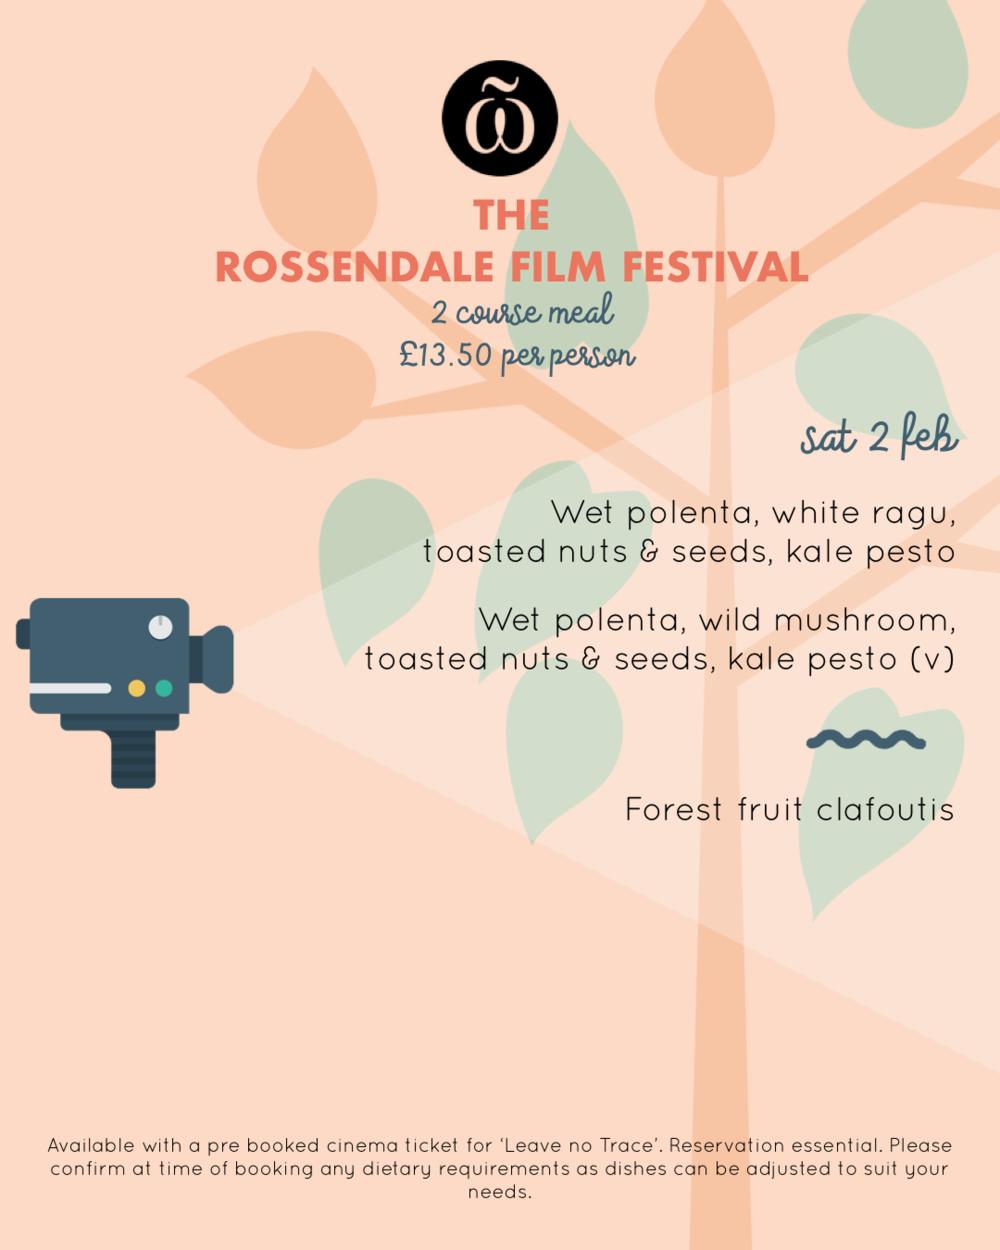 Rossendale Film Festival menu